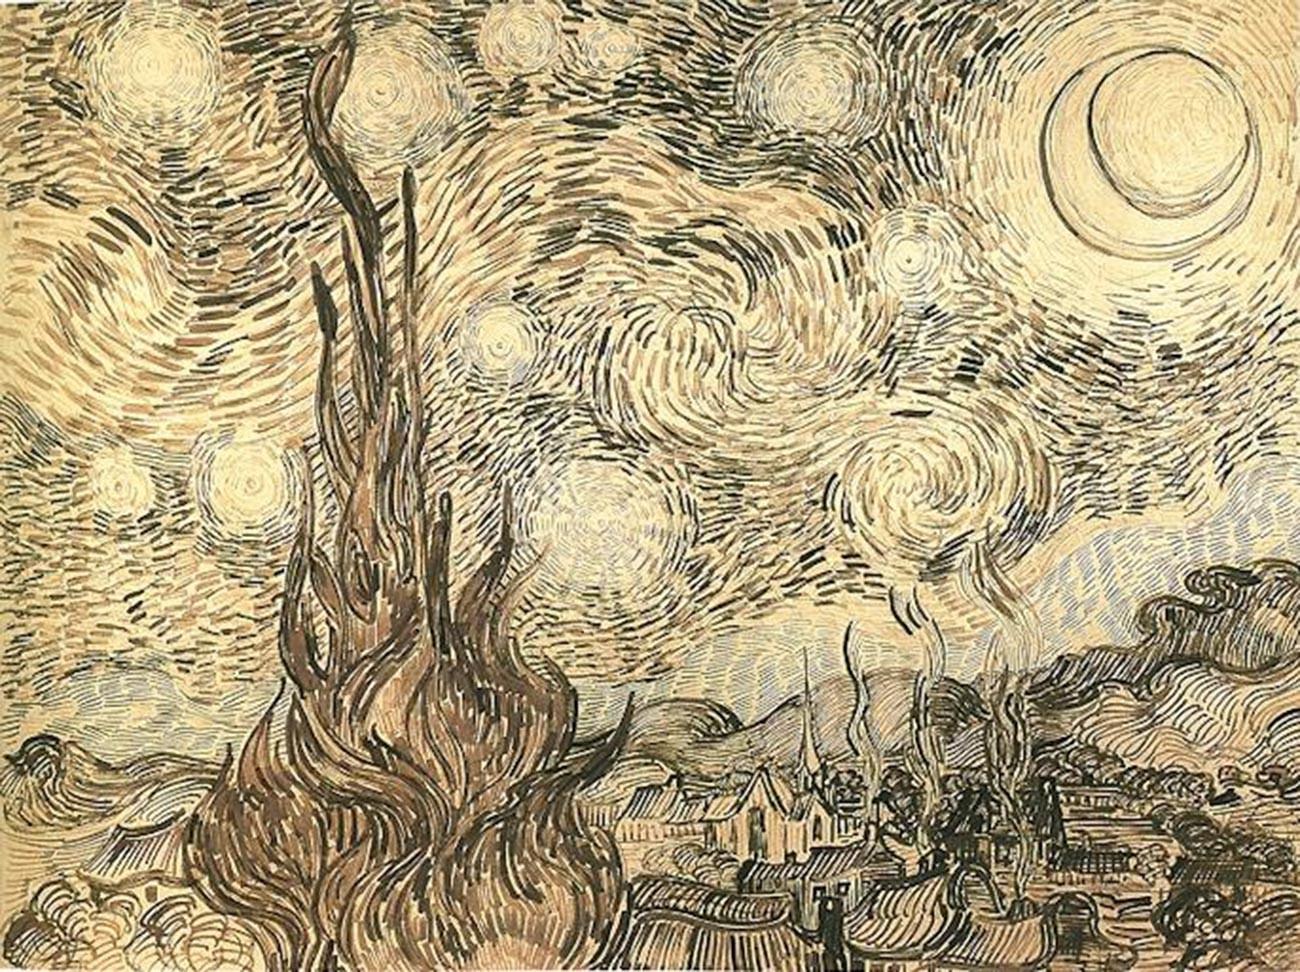 Vincent van Gogh. La noche estrellada